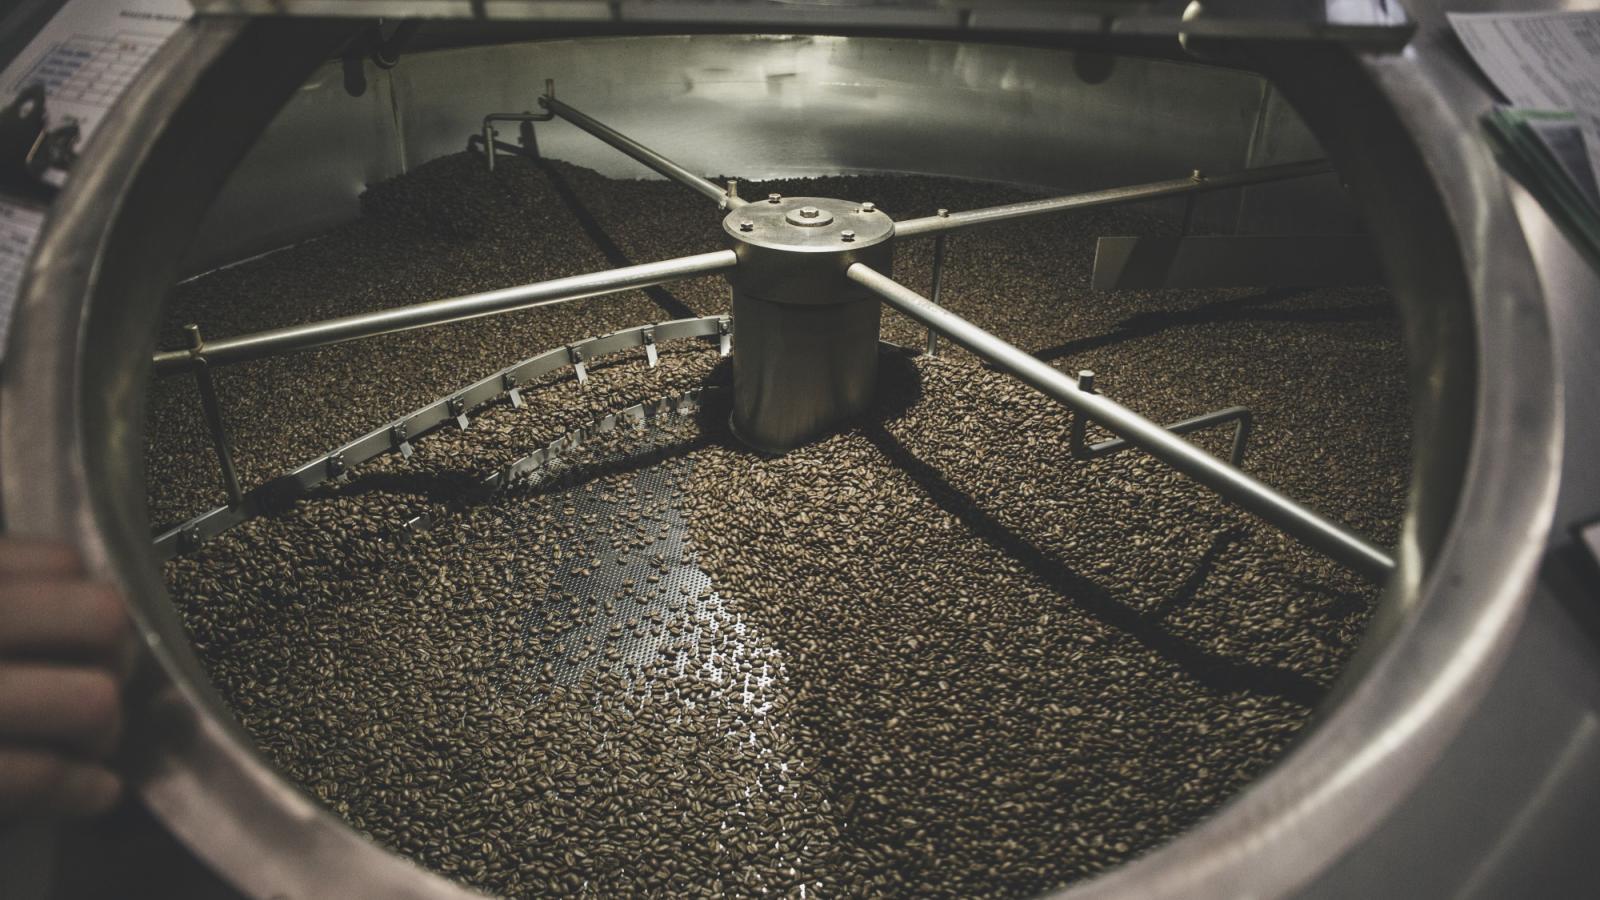 Coffee roasting, roasted coffee beans